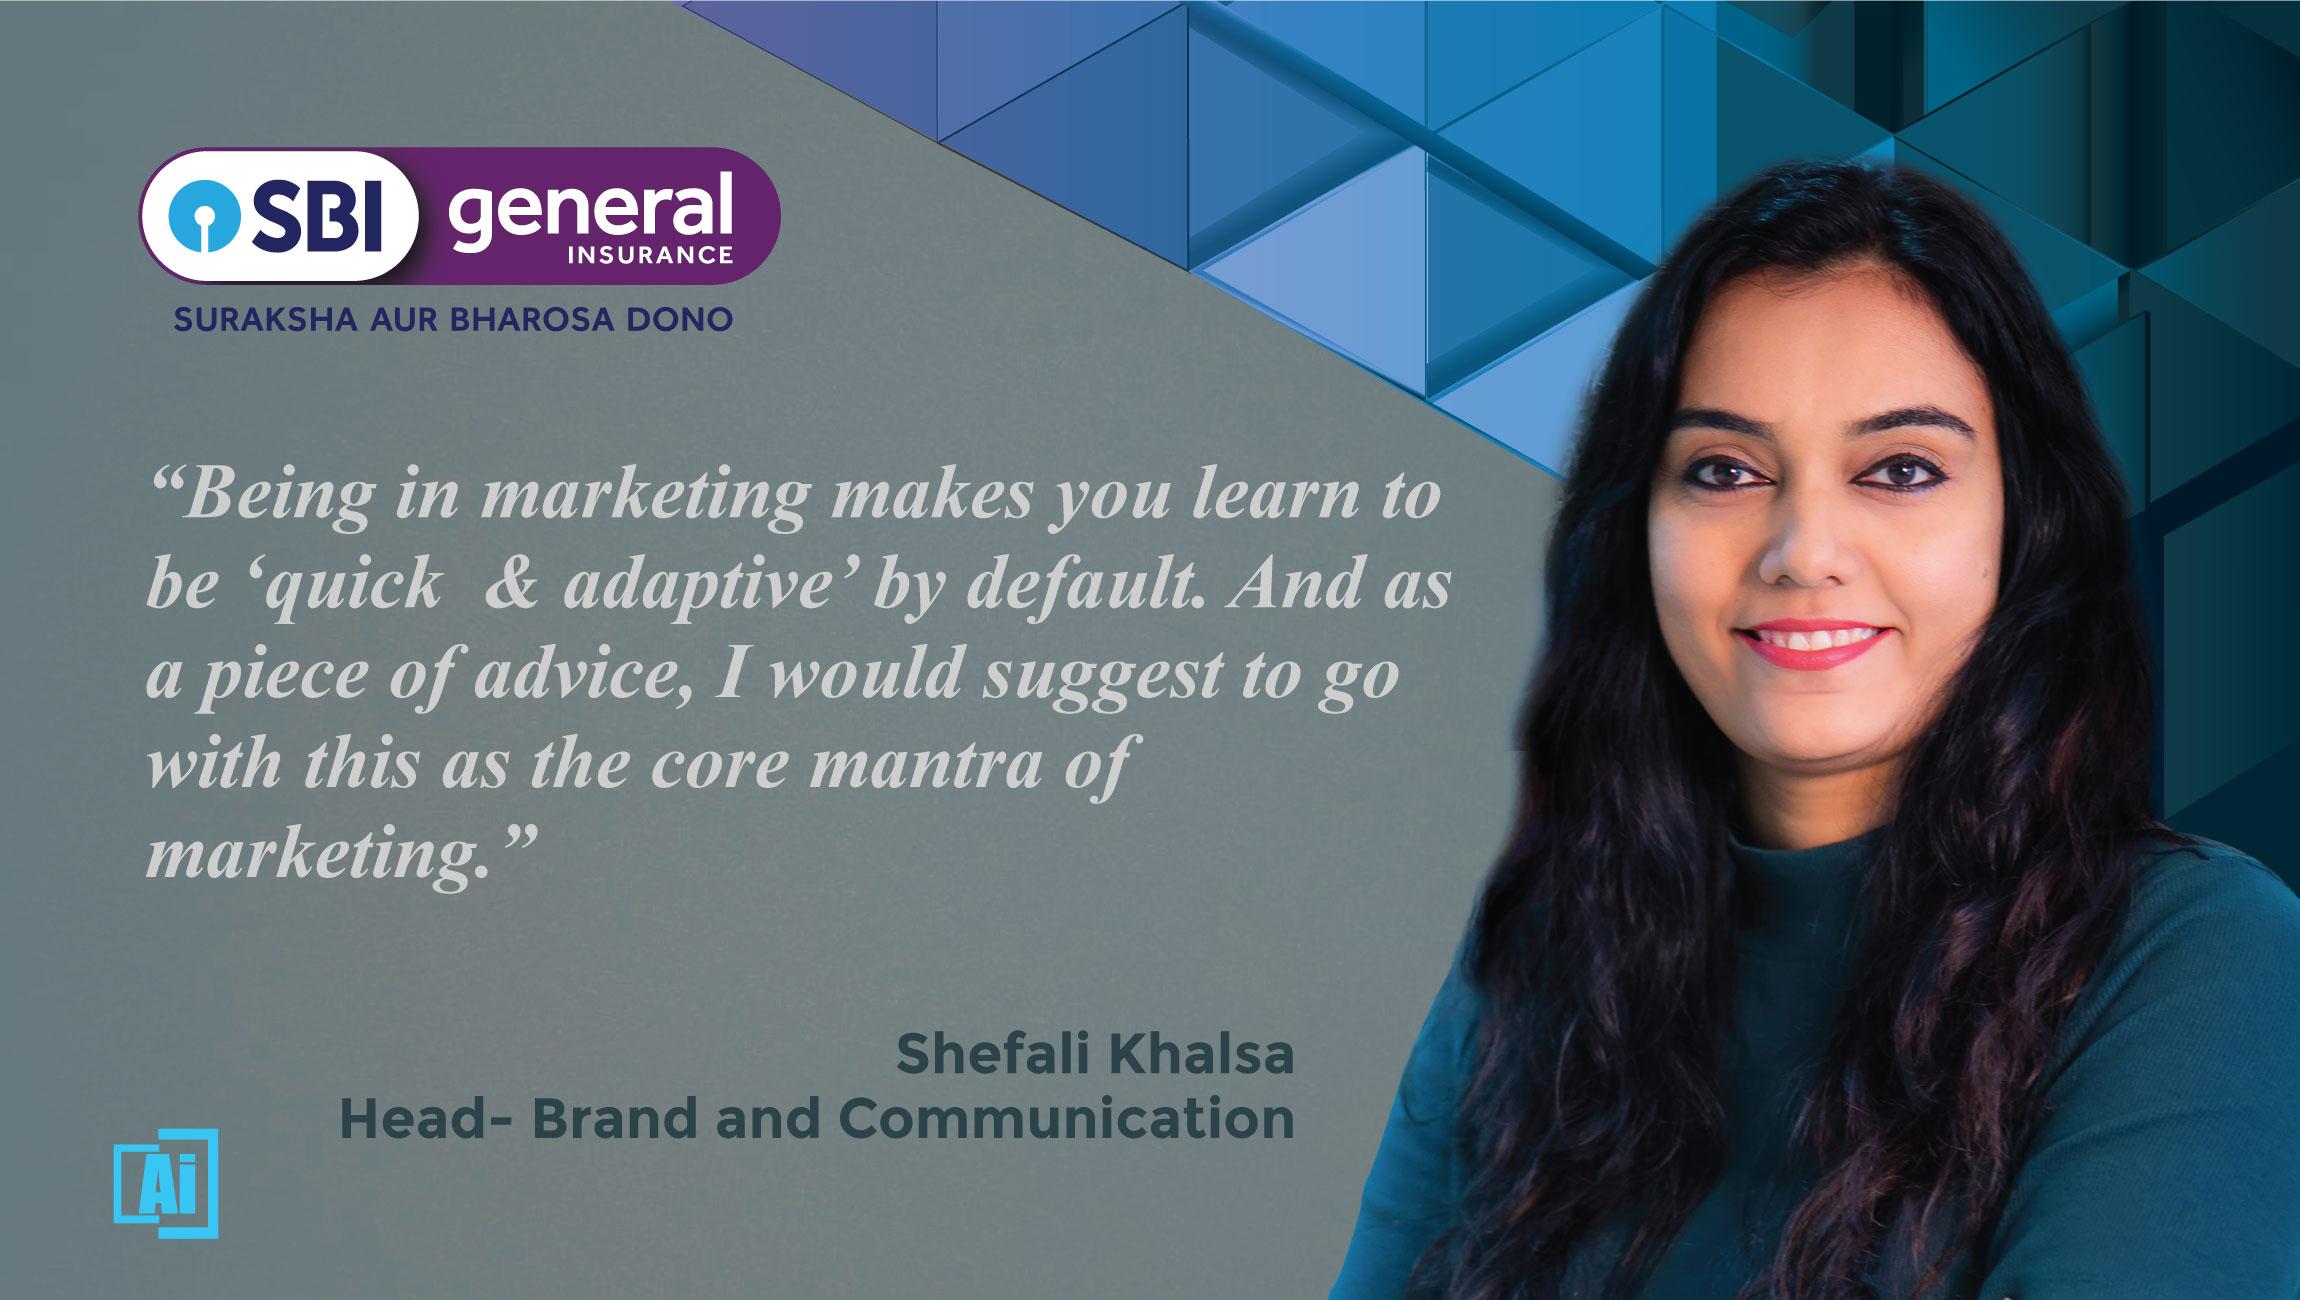 AiThority Interview with Shefali Khalsa, Head- Brand & Communication at SBI General Insurance